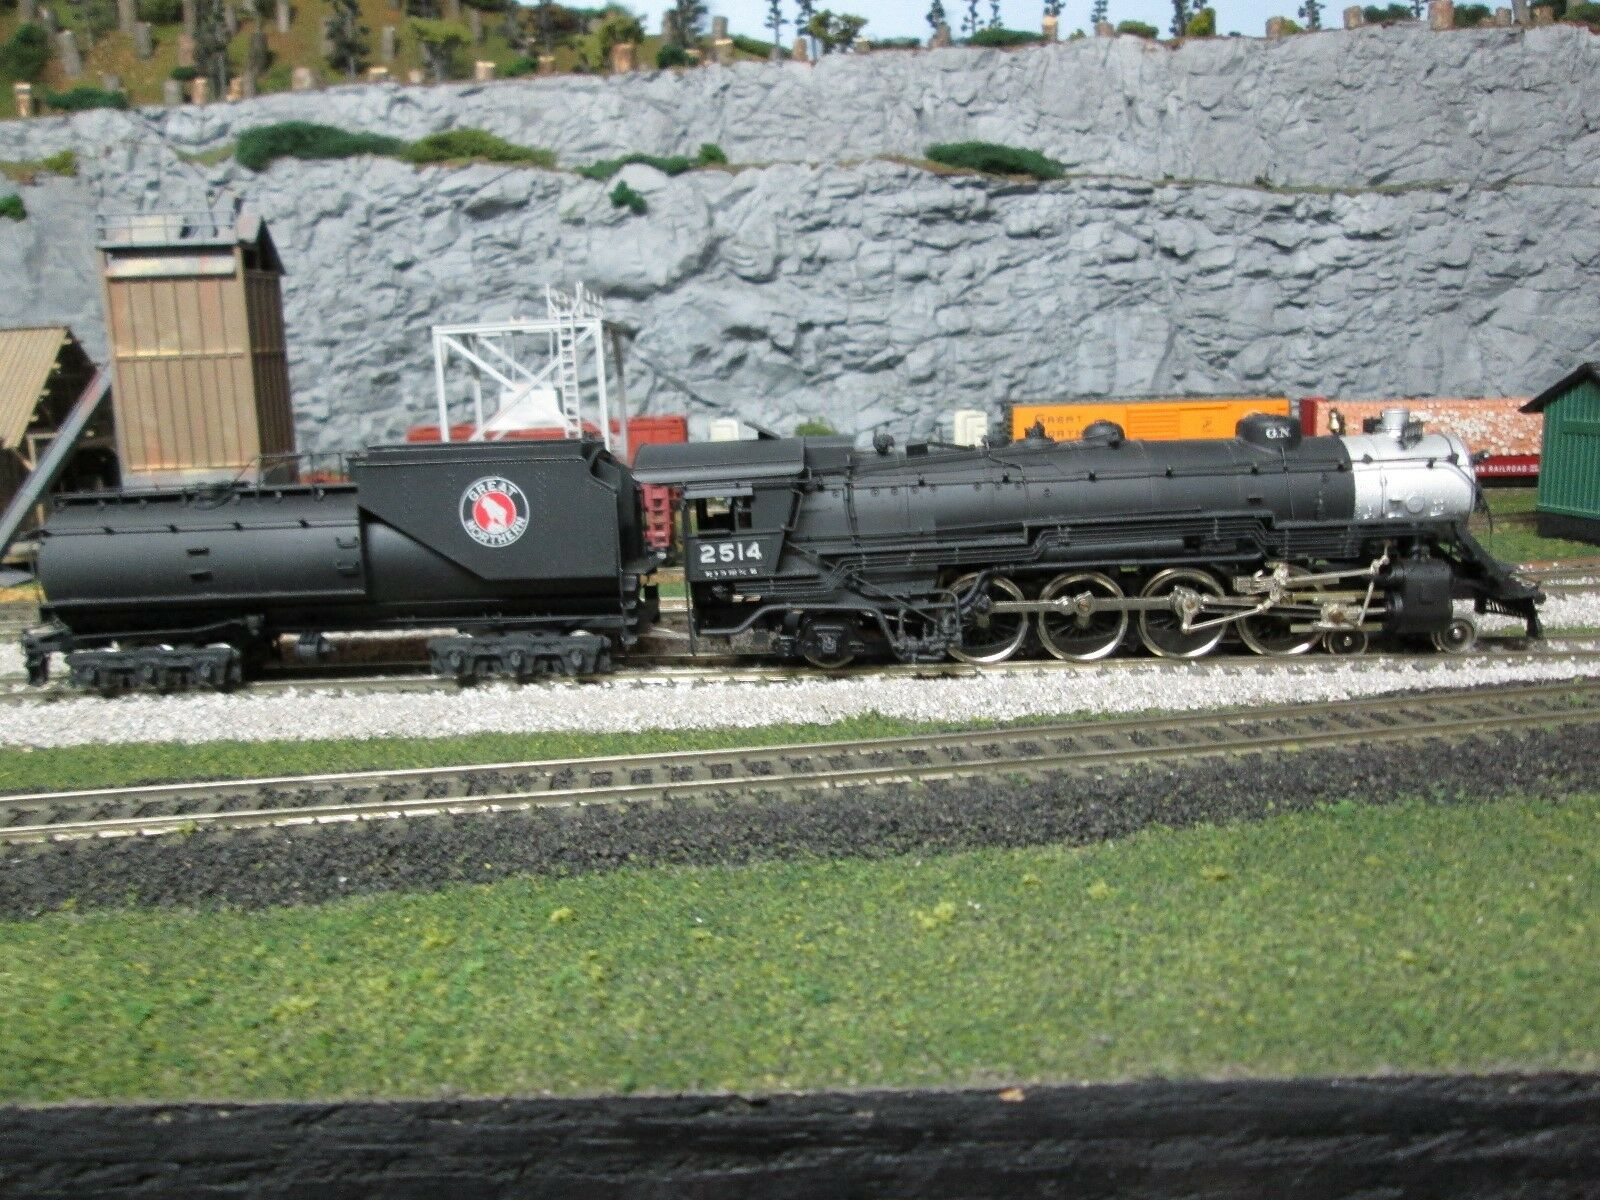 Ho Latón tenshodo pfm corona 162 Great Northern P-2 4-8-2 Locomotora de vapor 2514